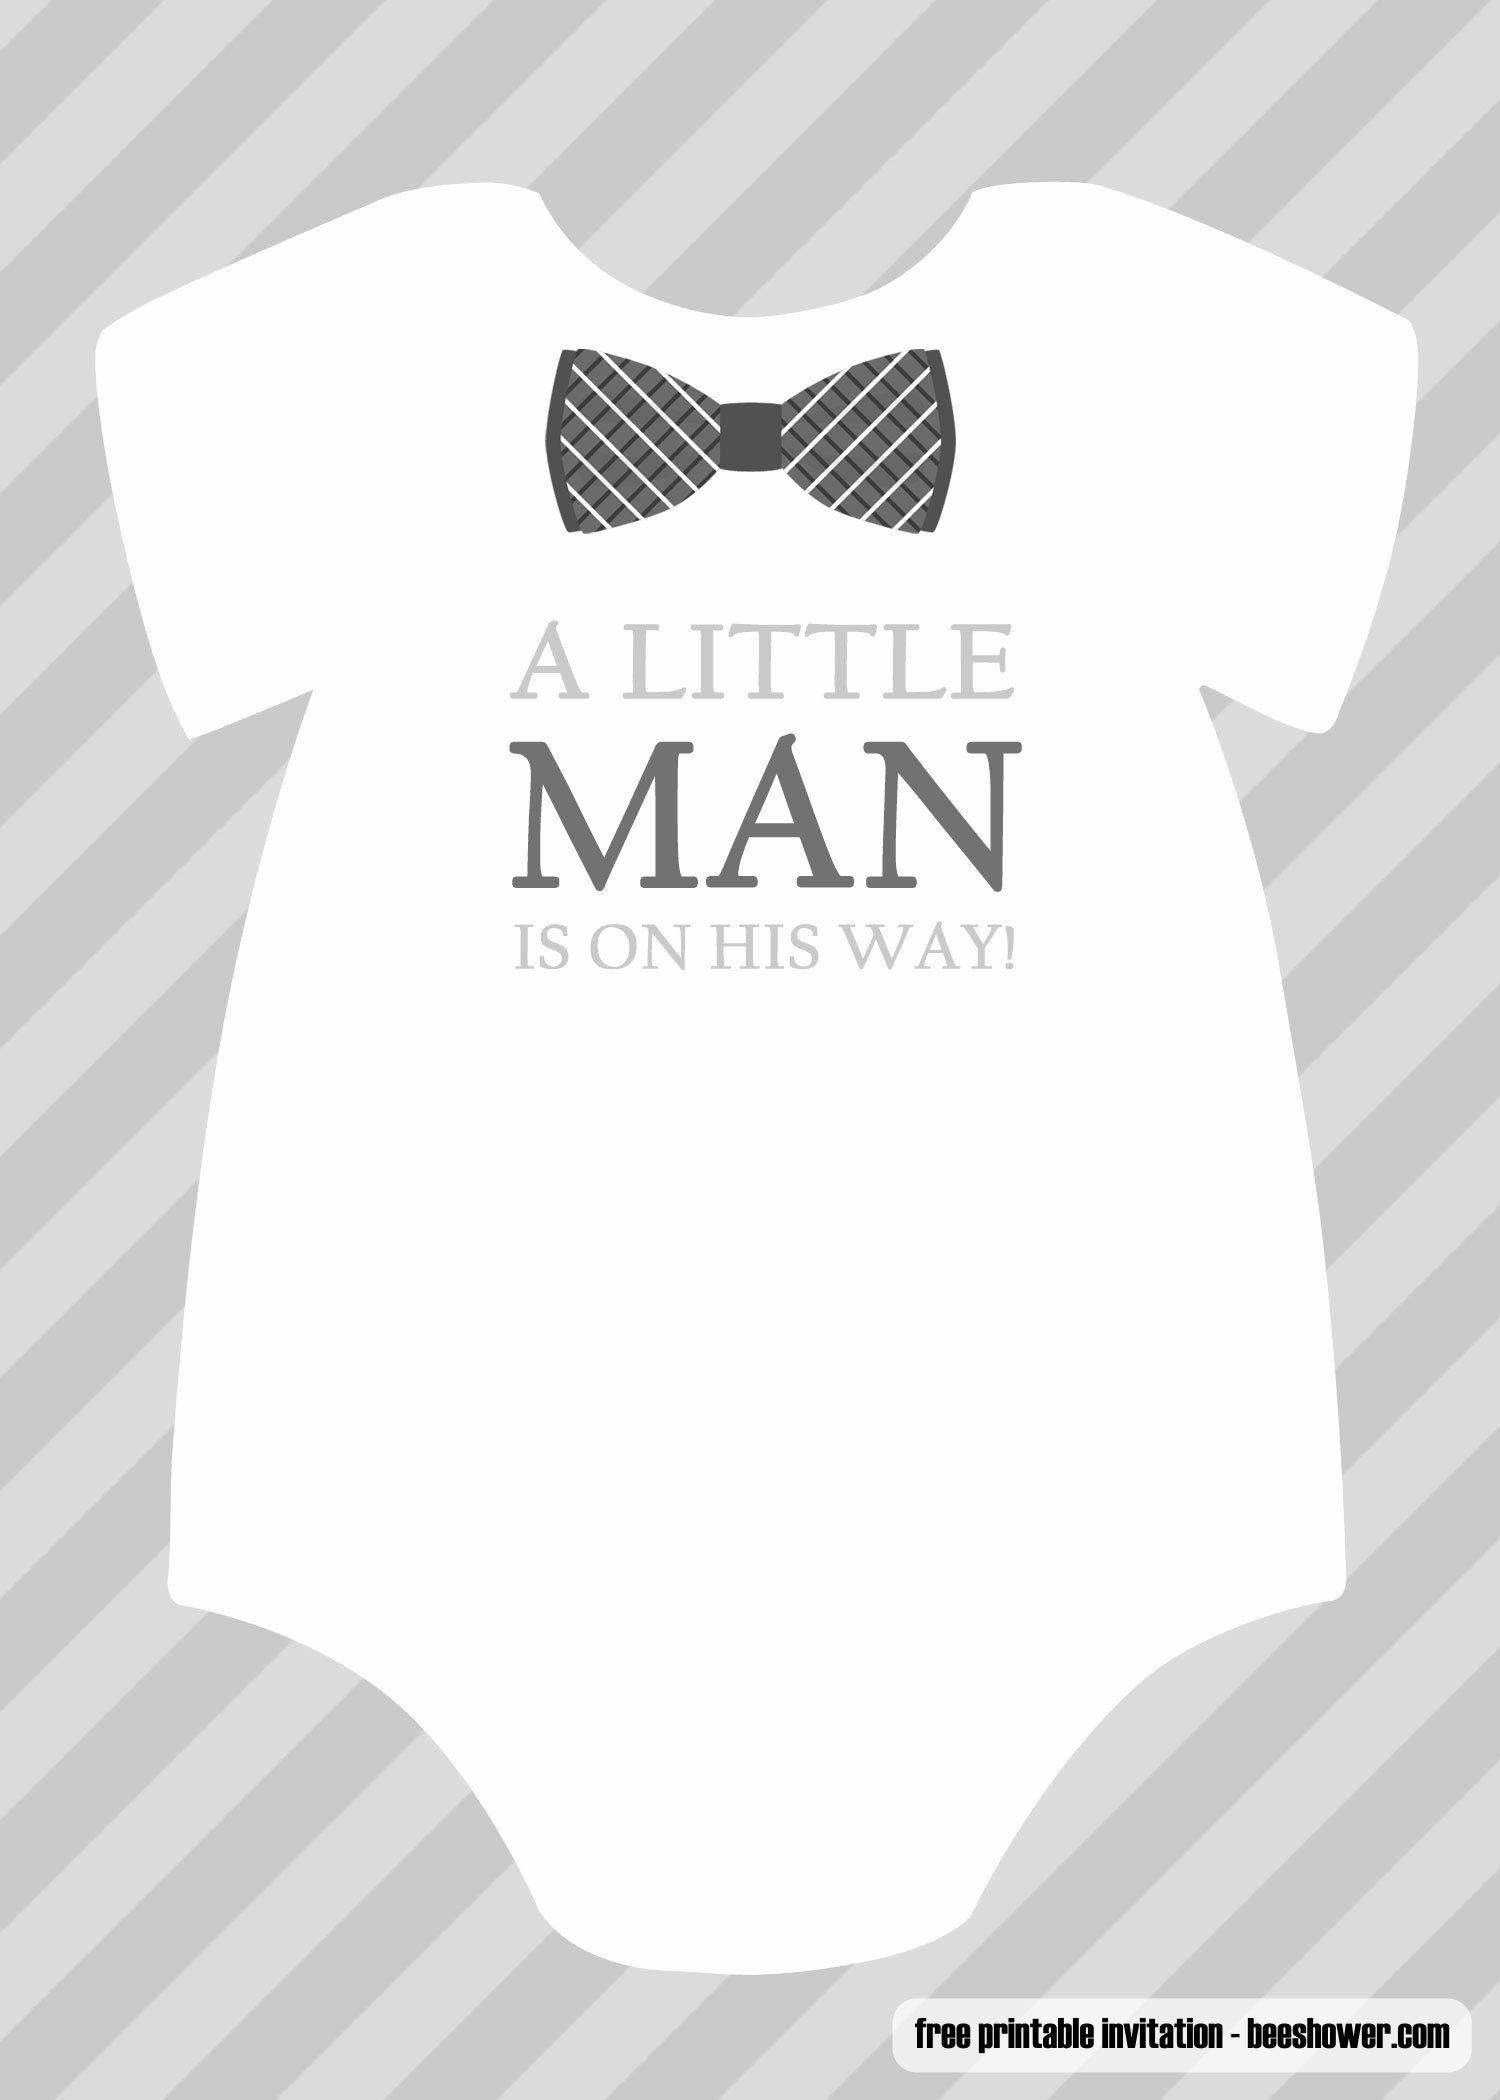 Printable Onesie Baby Shower Invitations Lovely Free Boy Boy Baby Shower Invitations Templates Baby Shower Invitations For Boys Onesie Baby Shower Invitations